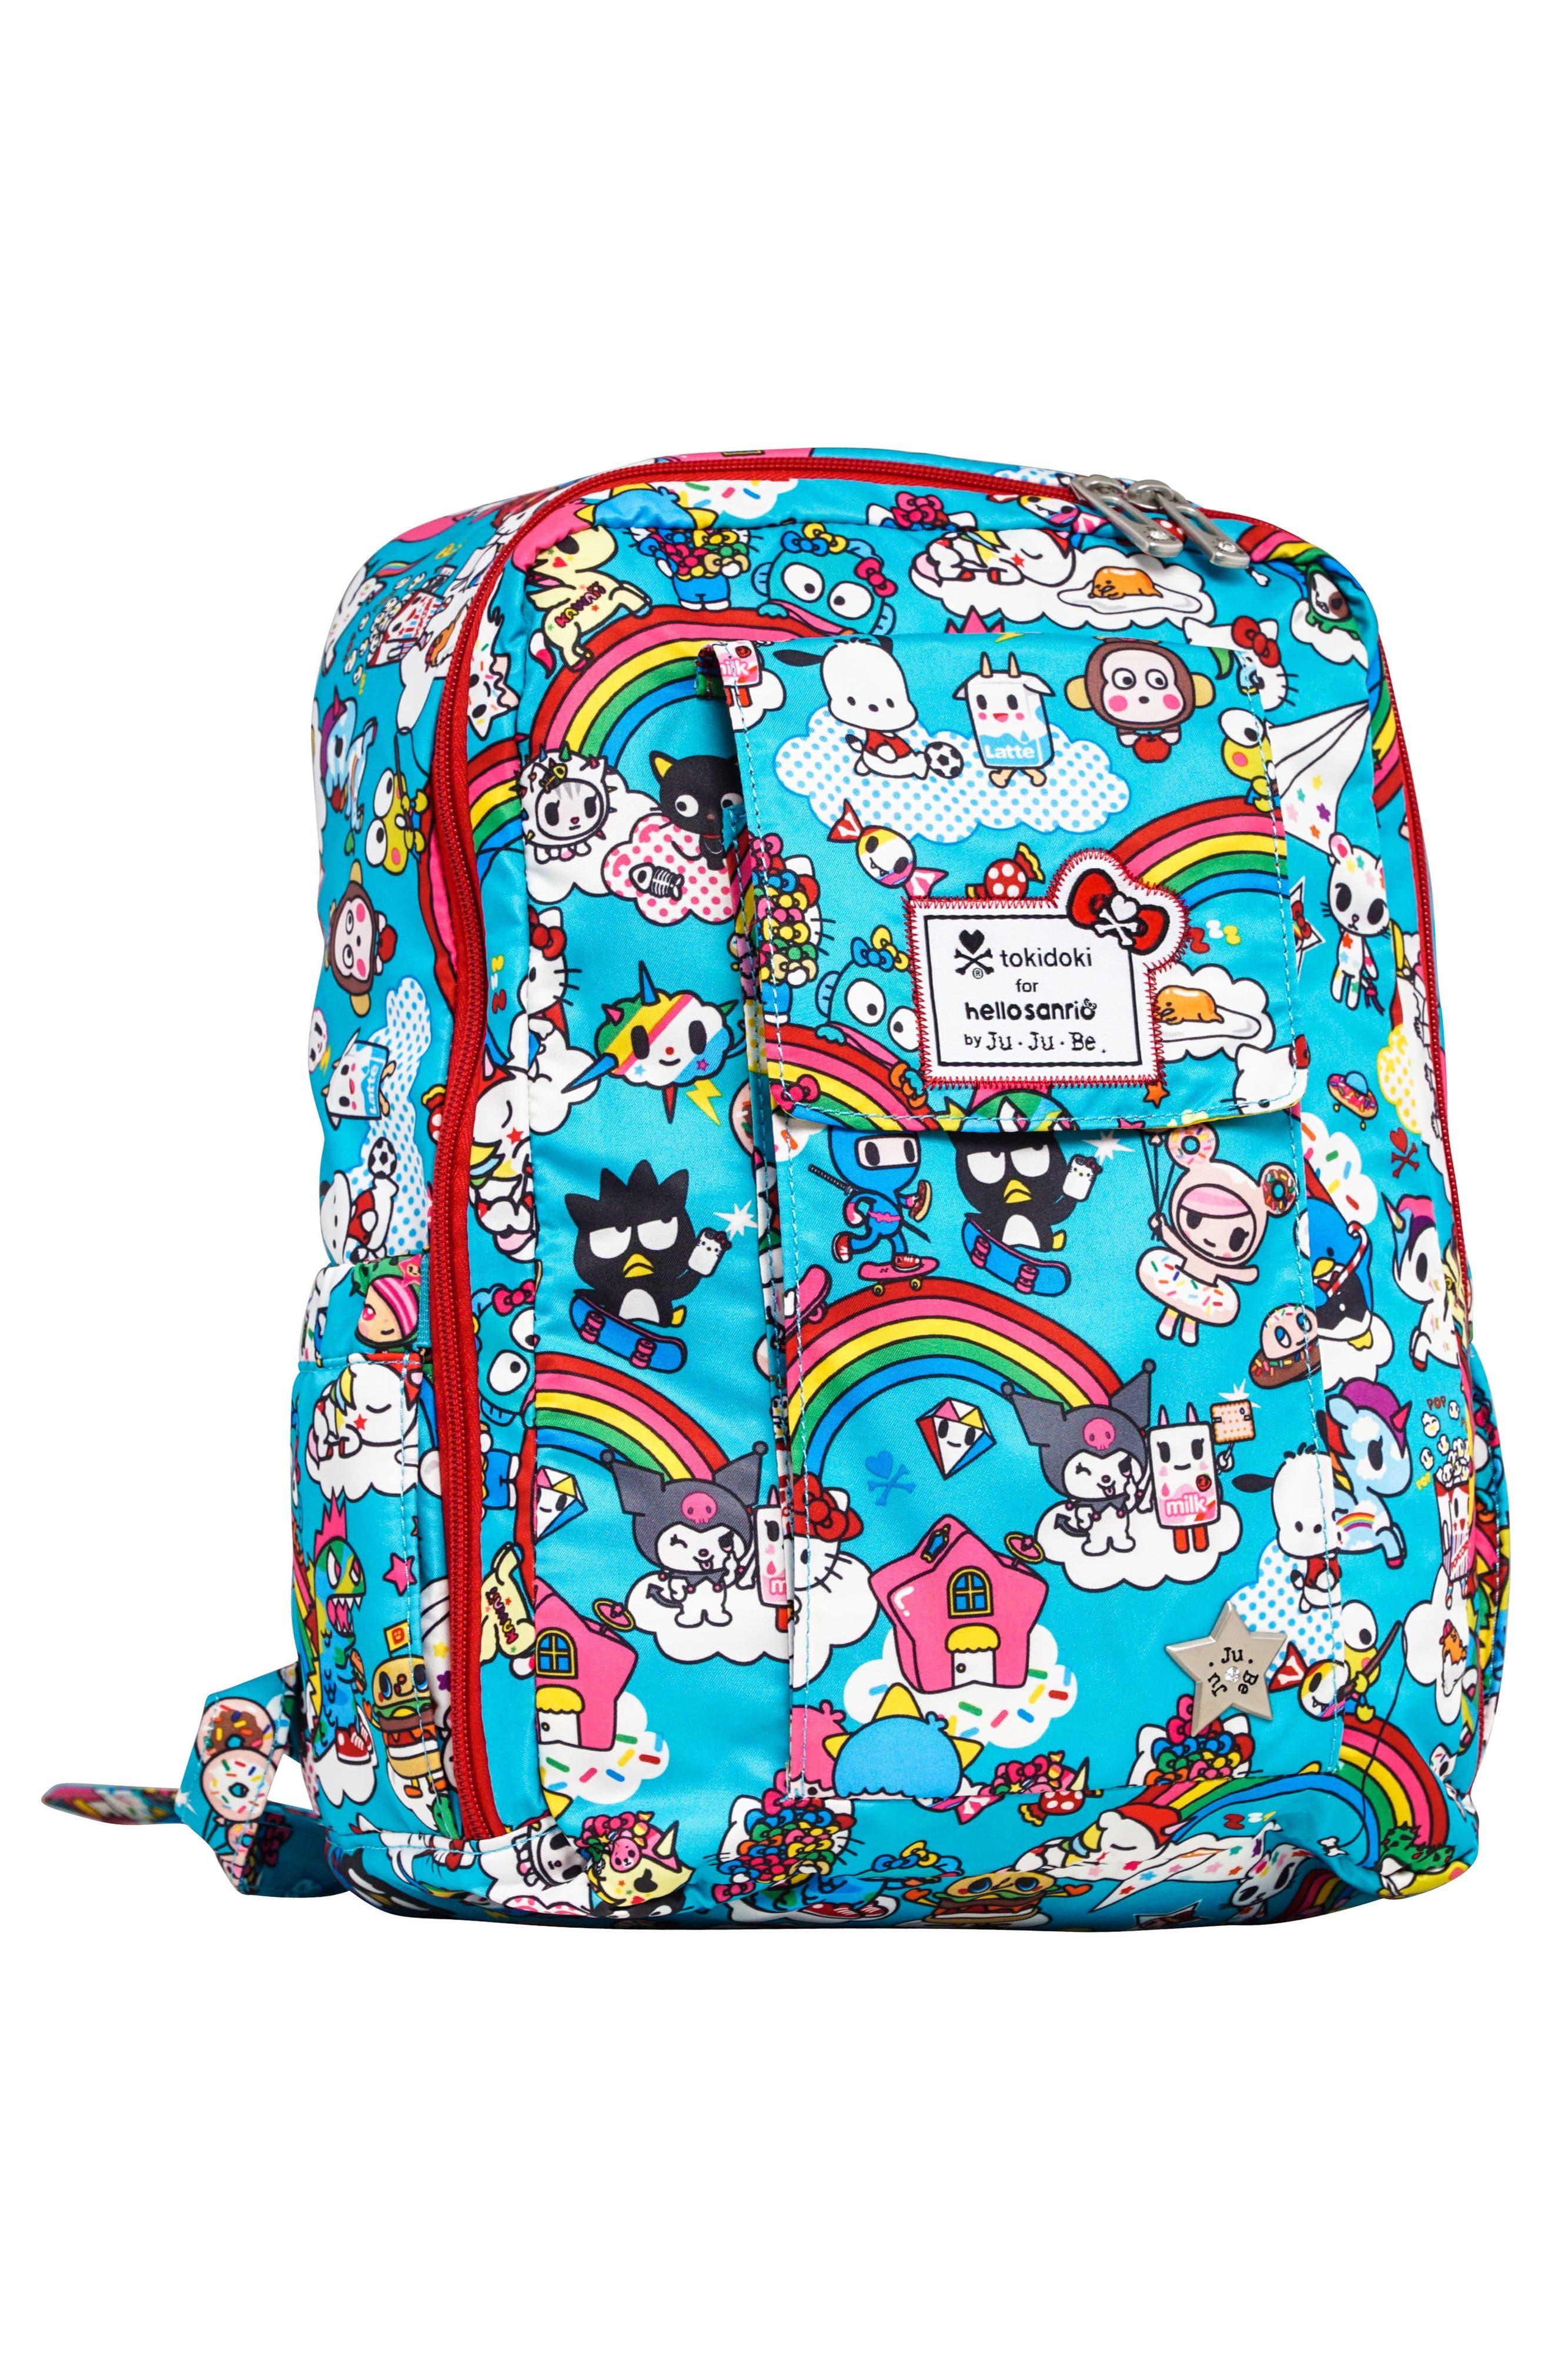 x tokidoki for Hello Sanrio Rainbow Dreams Be Mini Backpack,                             Alternate thumbnail 4, color,                             433